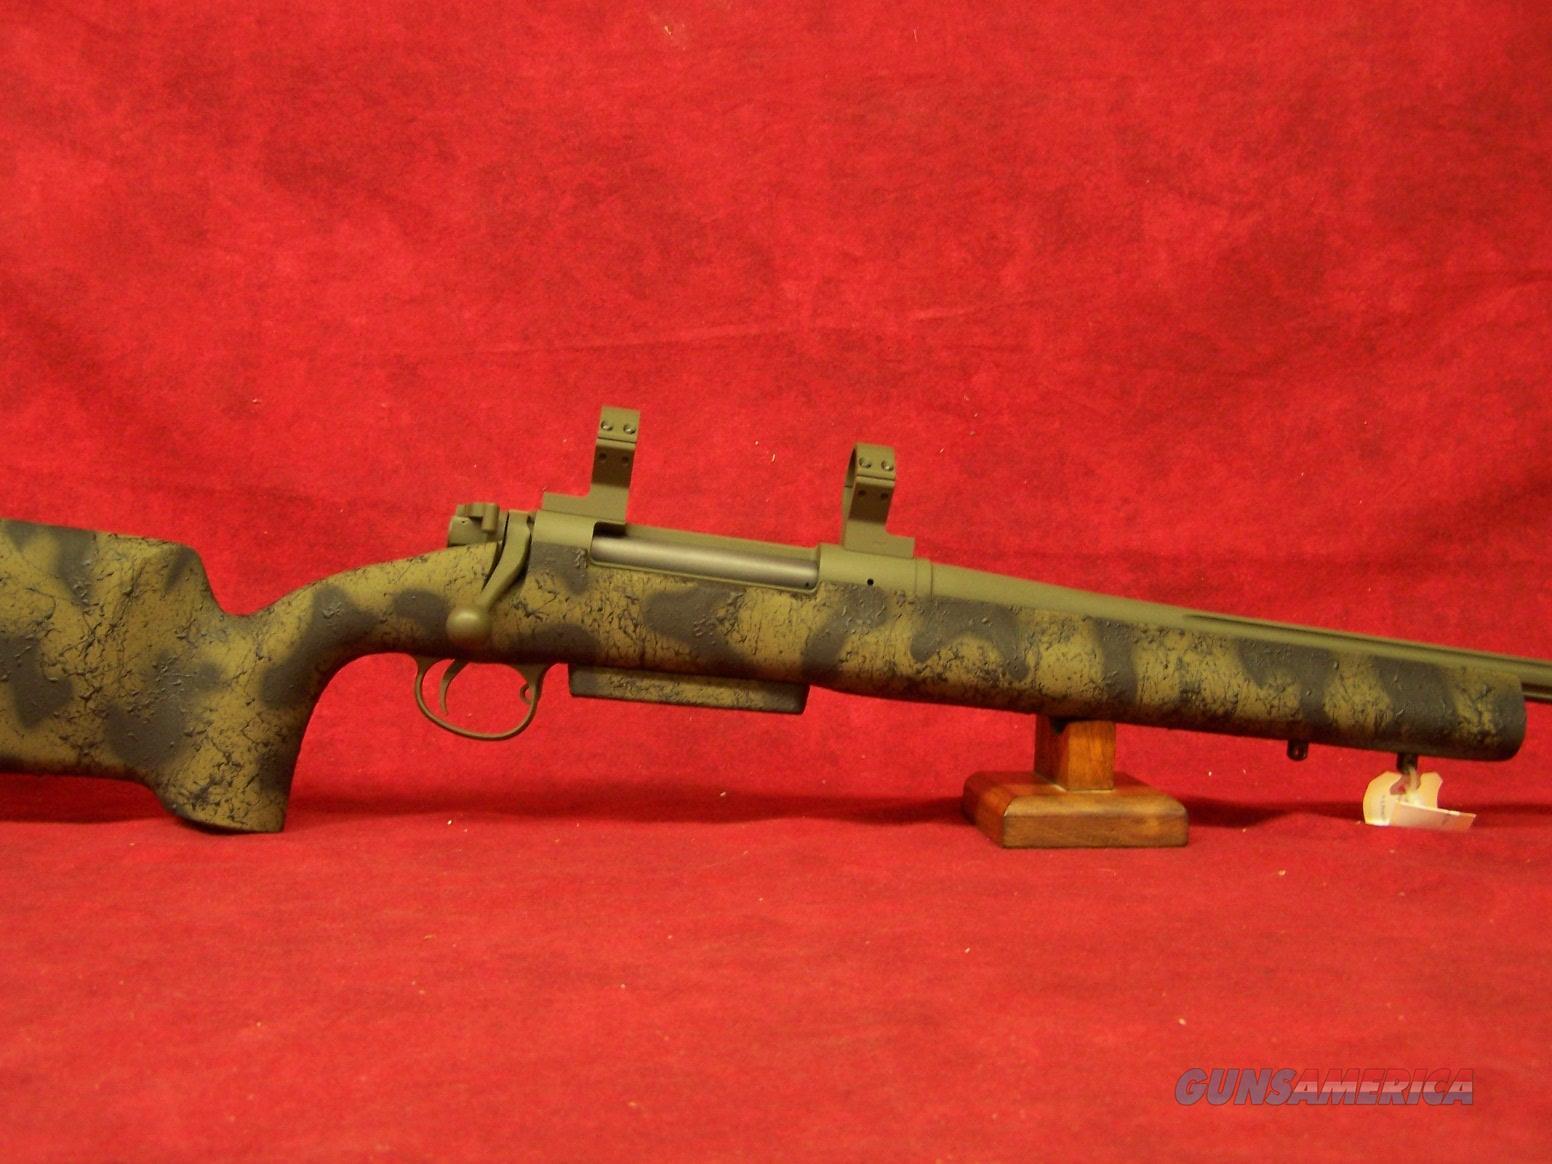 "H-S PRECISION Pro-Series 2000 LA PLR .338 Lapua 26"" Fluted OD Cerakote Barrel w/Brake Green and Black camo stock HS precision (Professional Long Range Hunter)  Guns > Rifles > HS Precision Rifles"